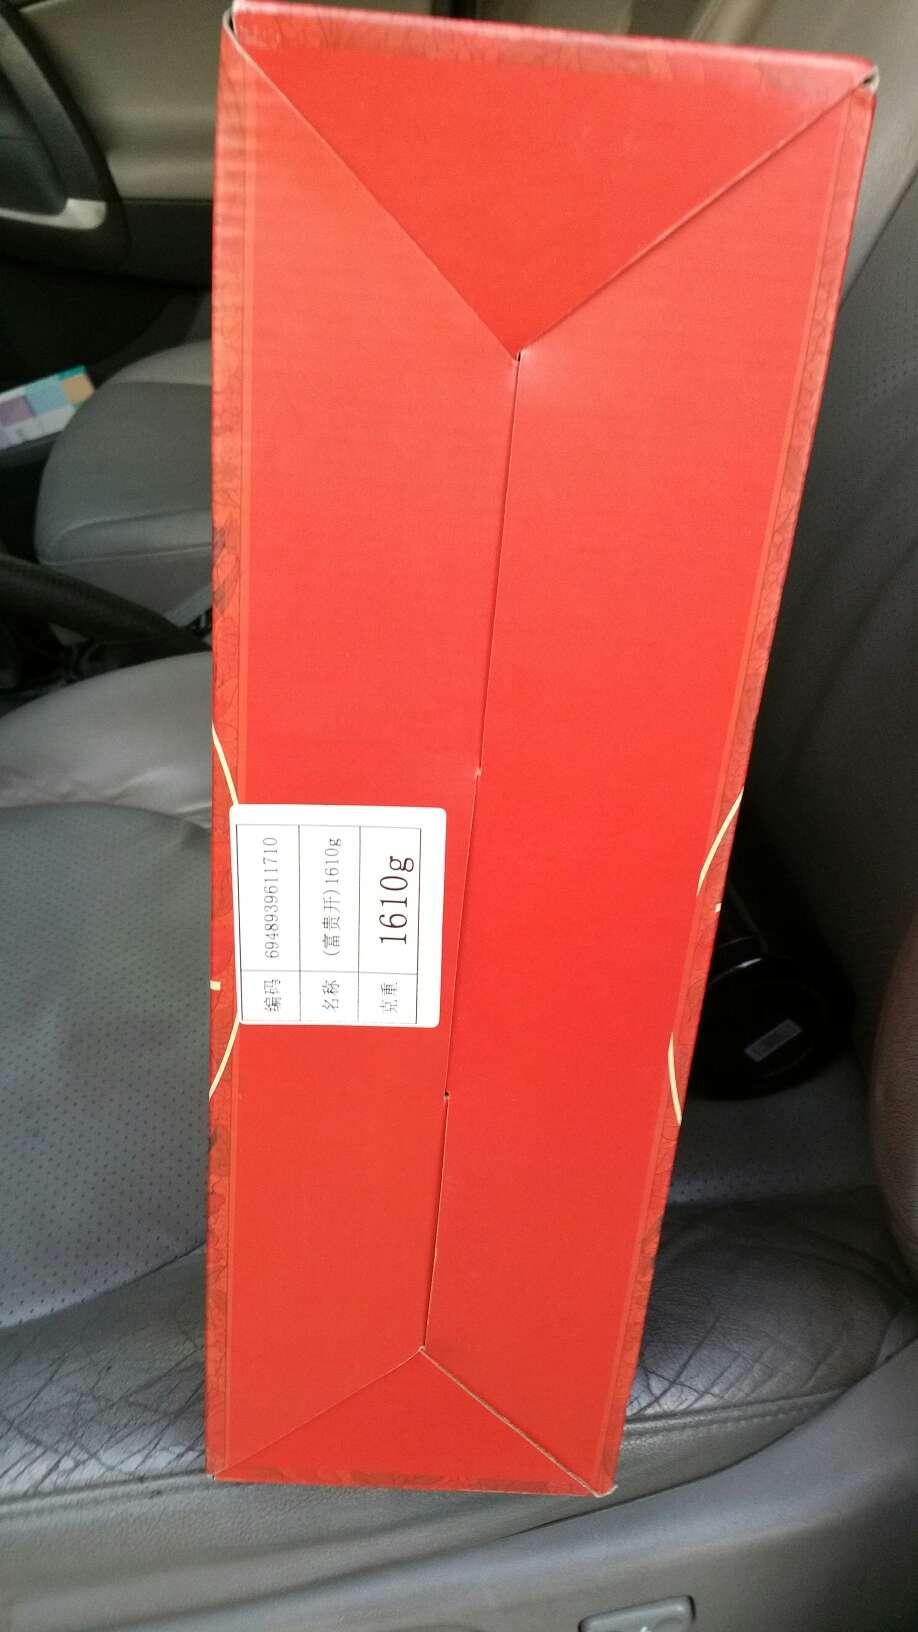 cheap rings online shopping 00970701 bags